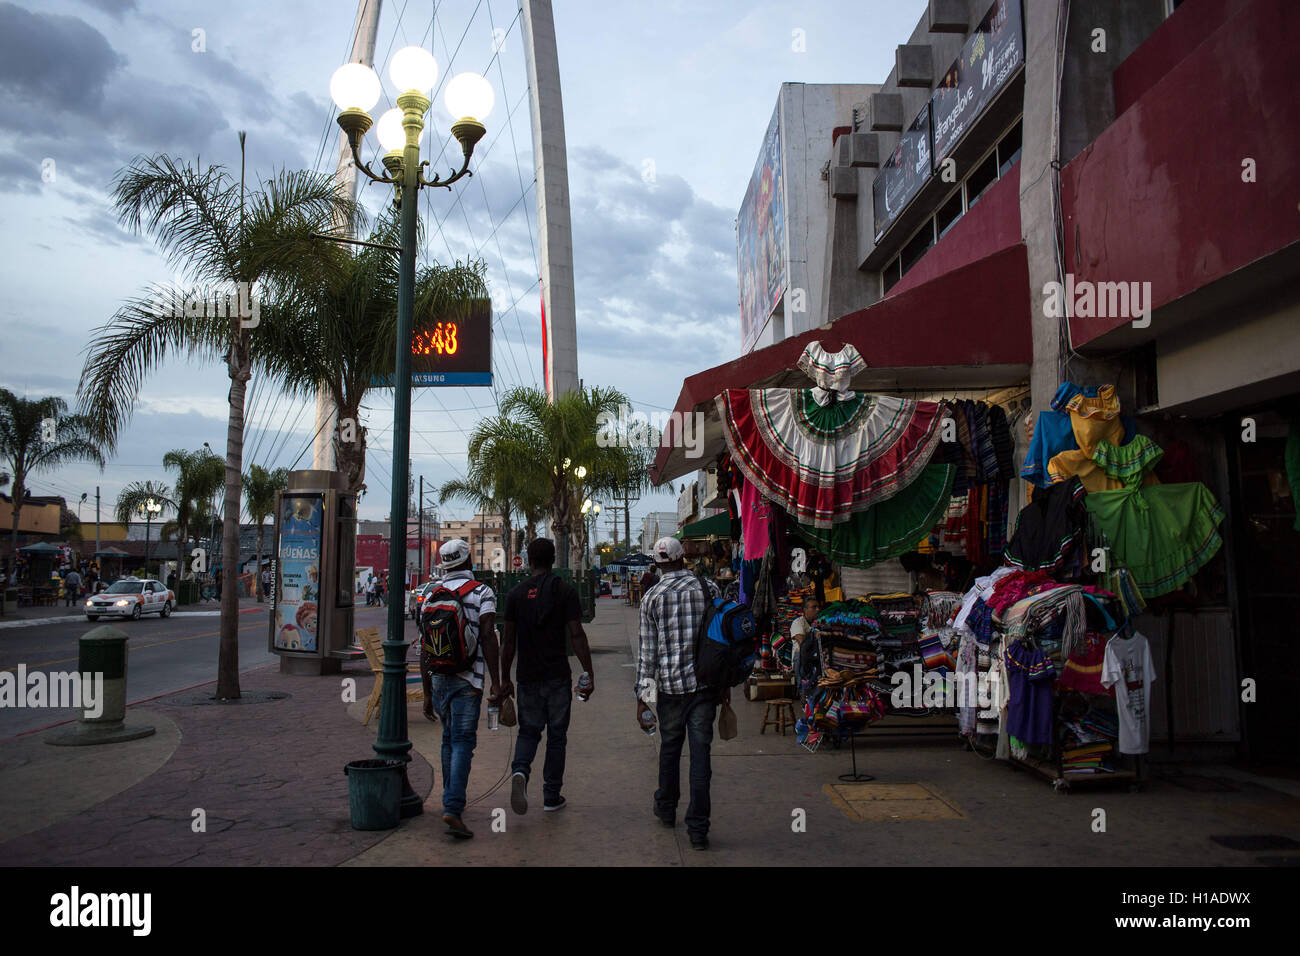 Tijuana, BAJA CALIFORNIA, MEXICO. 19th Sep, 2016. Haitian migrants seeking to enter the United States walk downtown Stock Photo